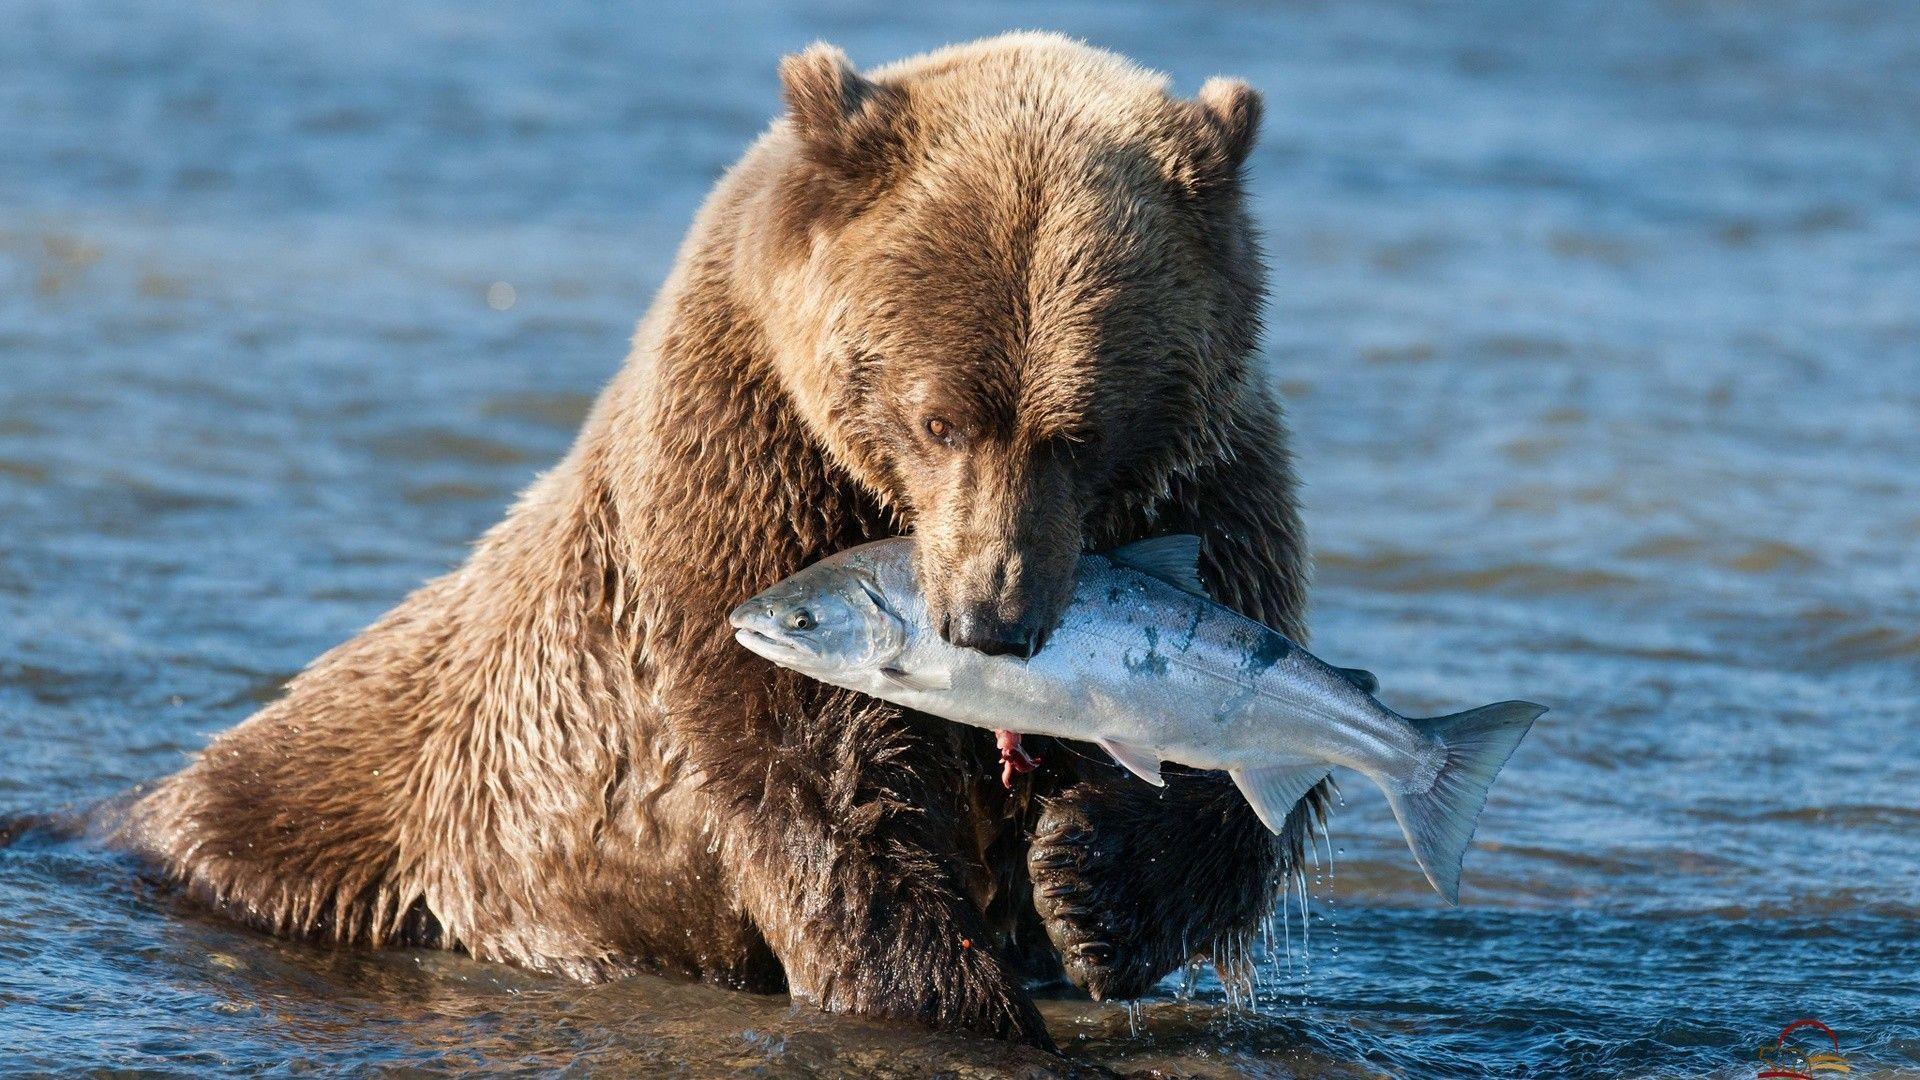 Bear Grizzly Bear Fish wallpaper   1920x1080   120920   WallpaperUP